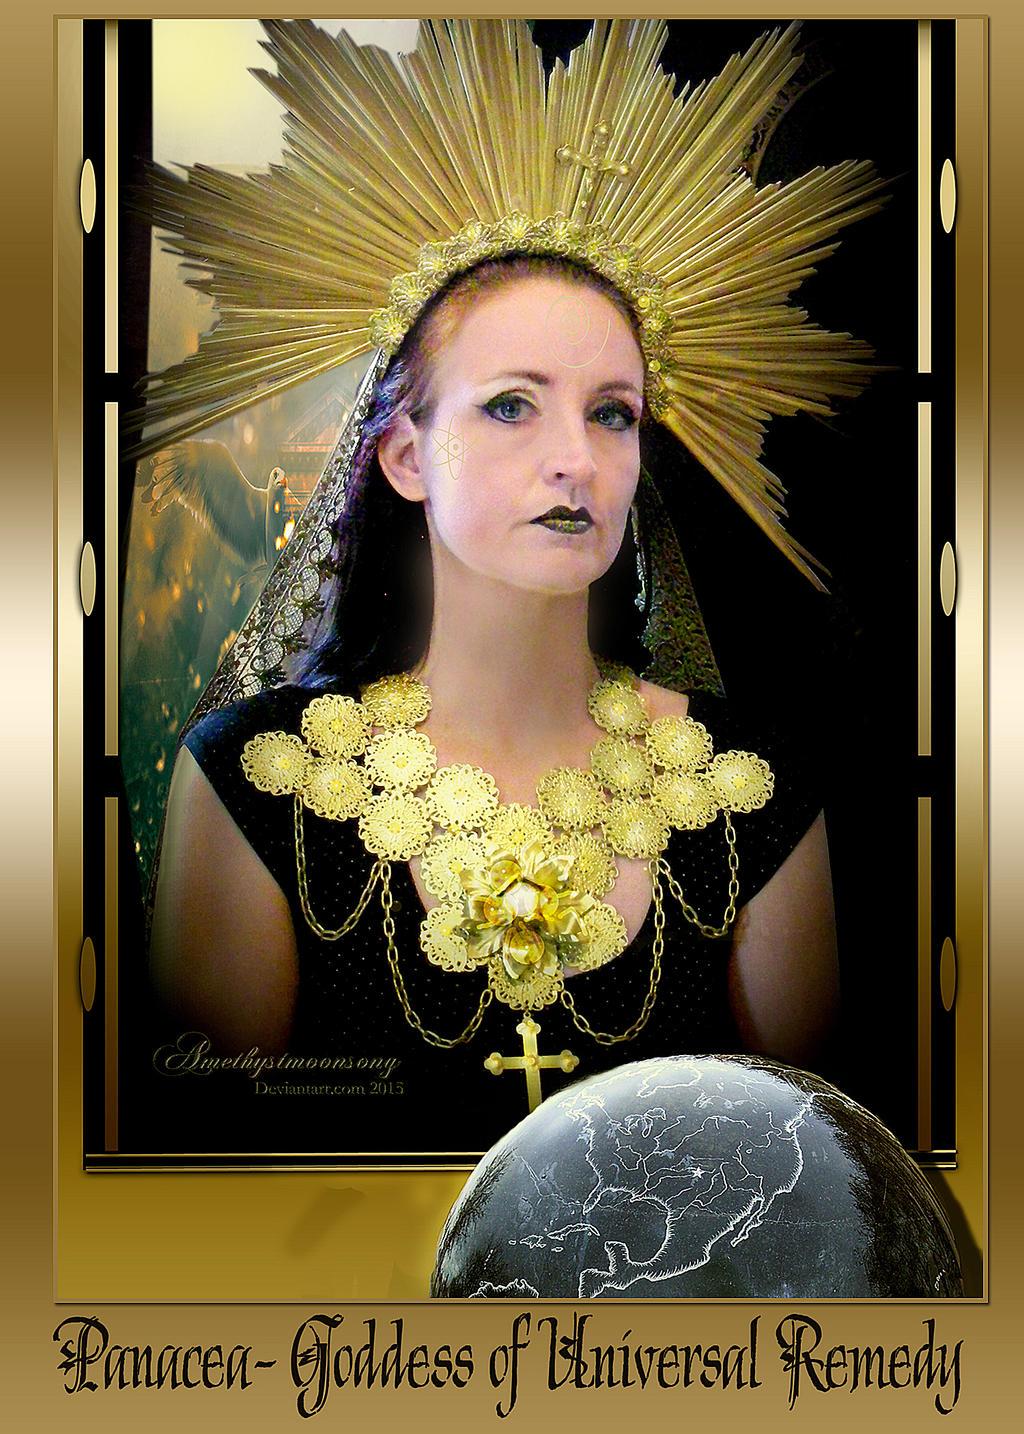 Panacea- Goddess Of Universal Remedy By Amethystmoonsong